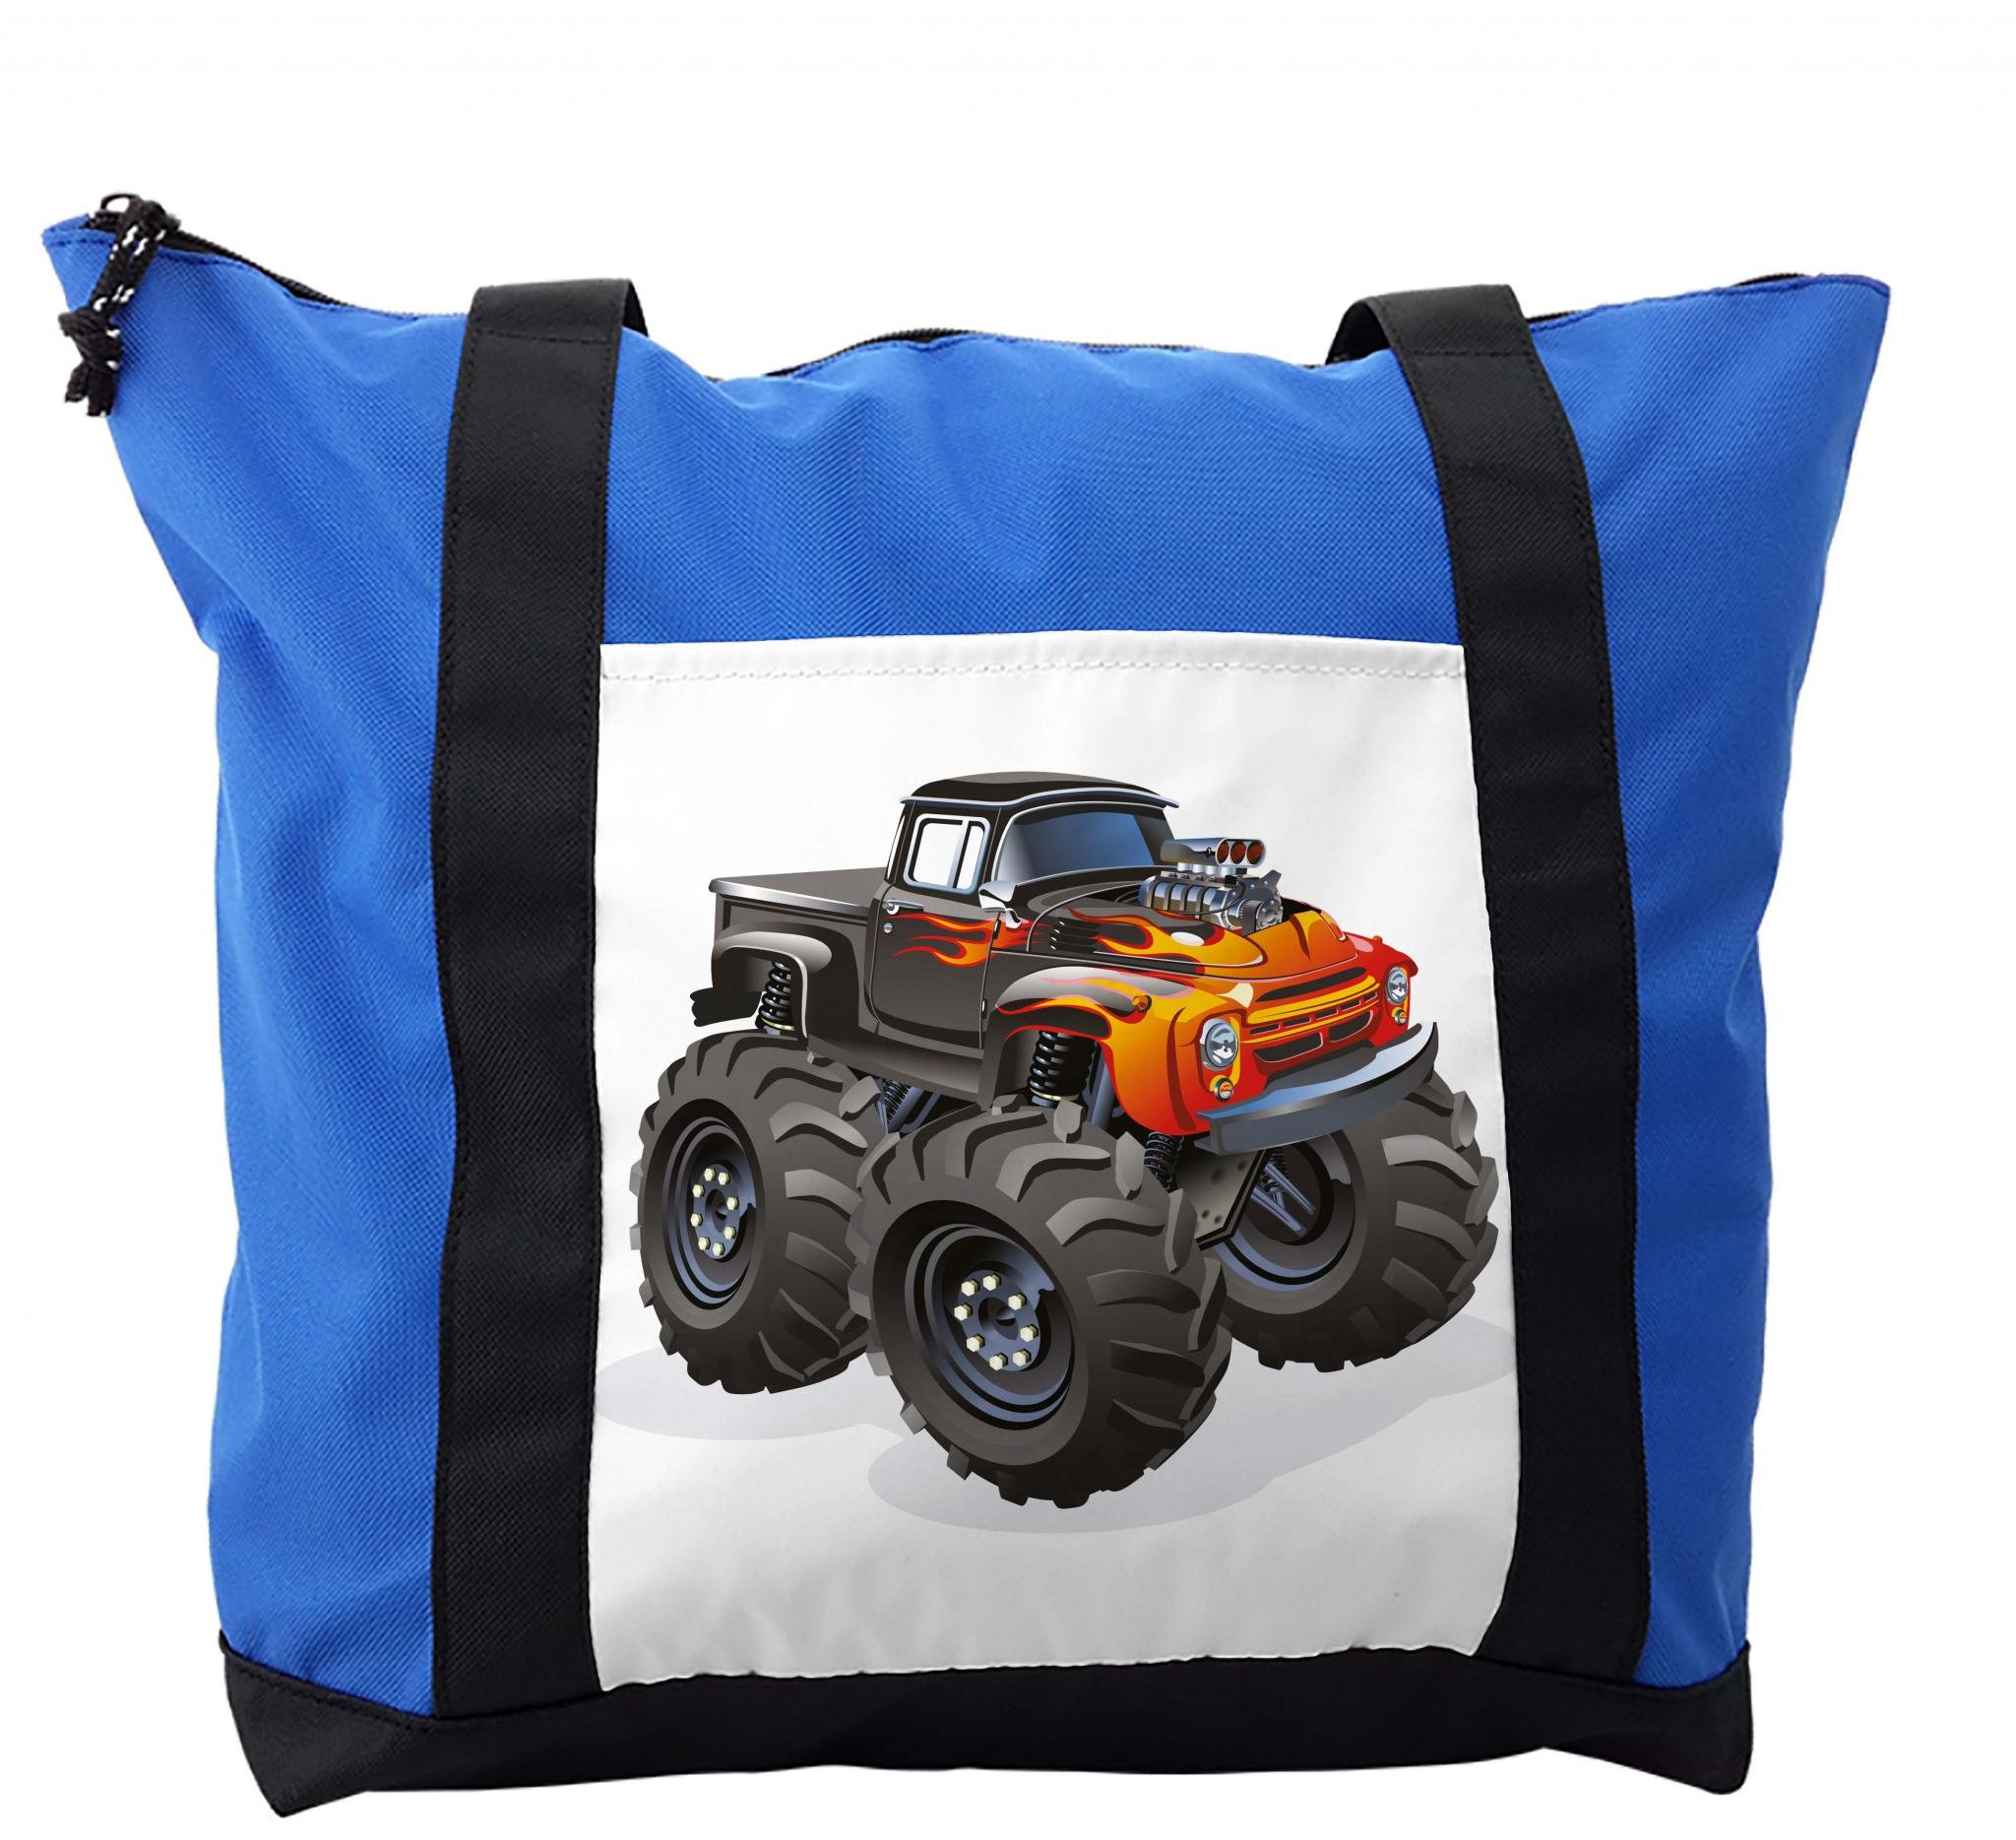 Lunarable Boy's Room Shoulder Bag, Monster Truck in Flame, Durable with Zipper